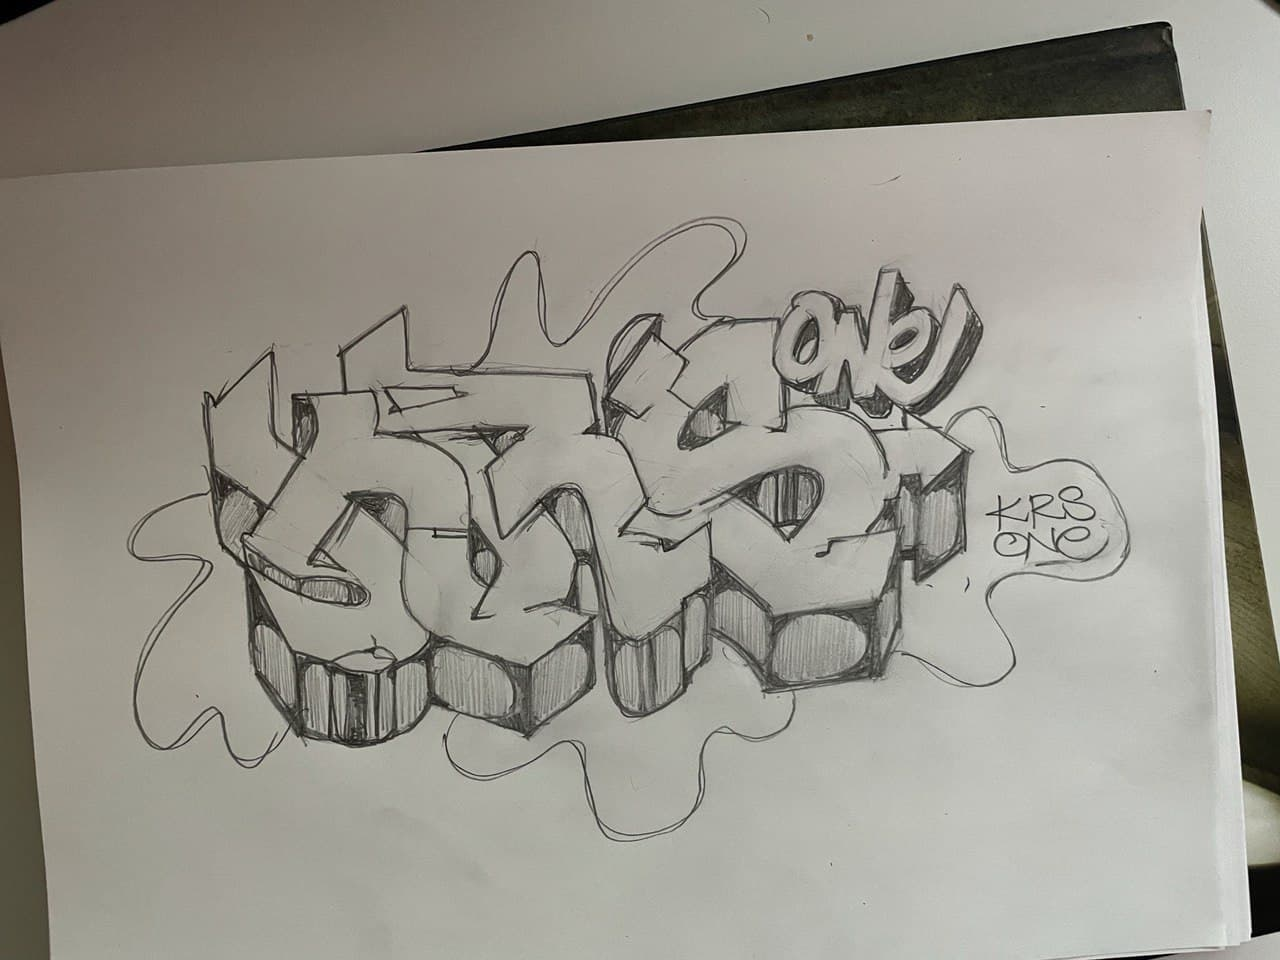 krs - Copy.jpg